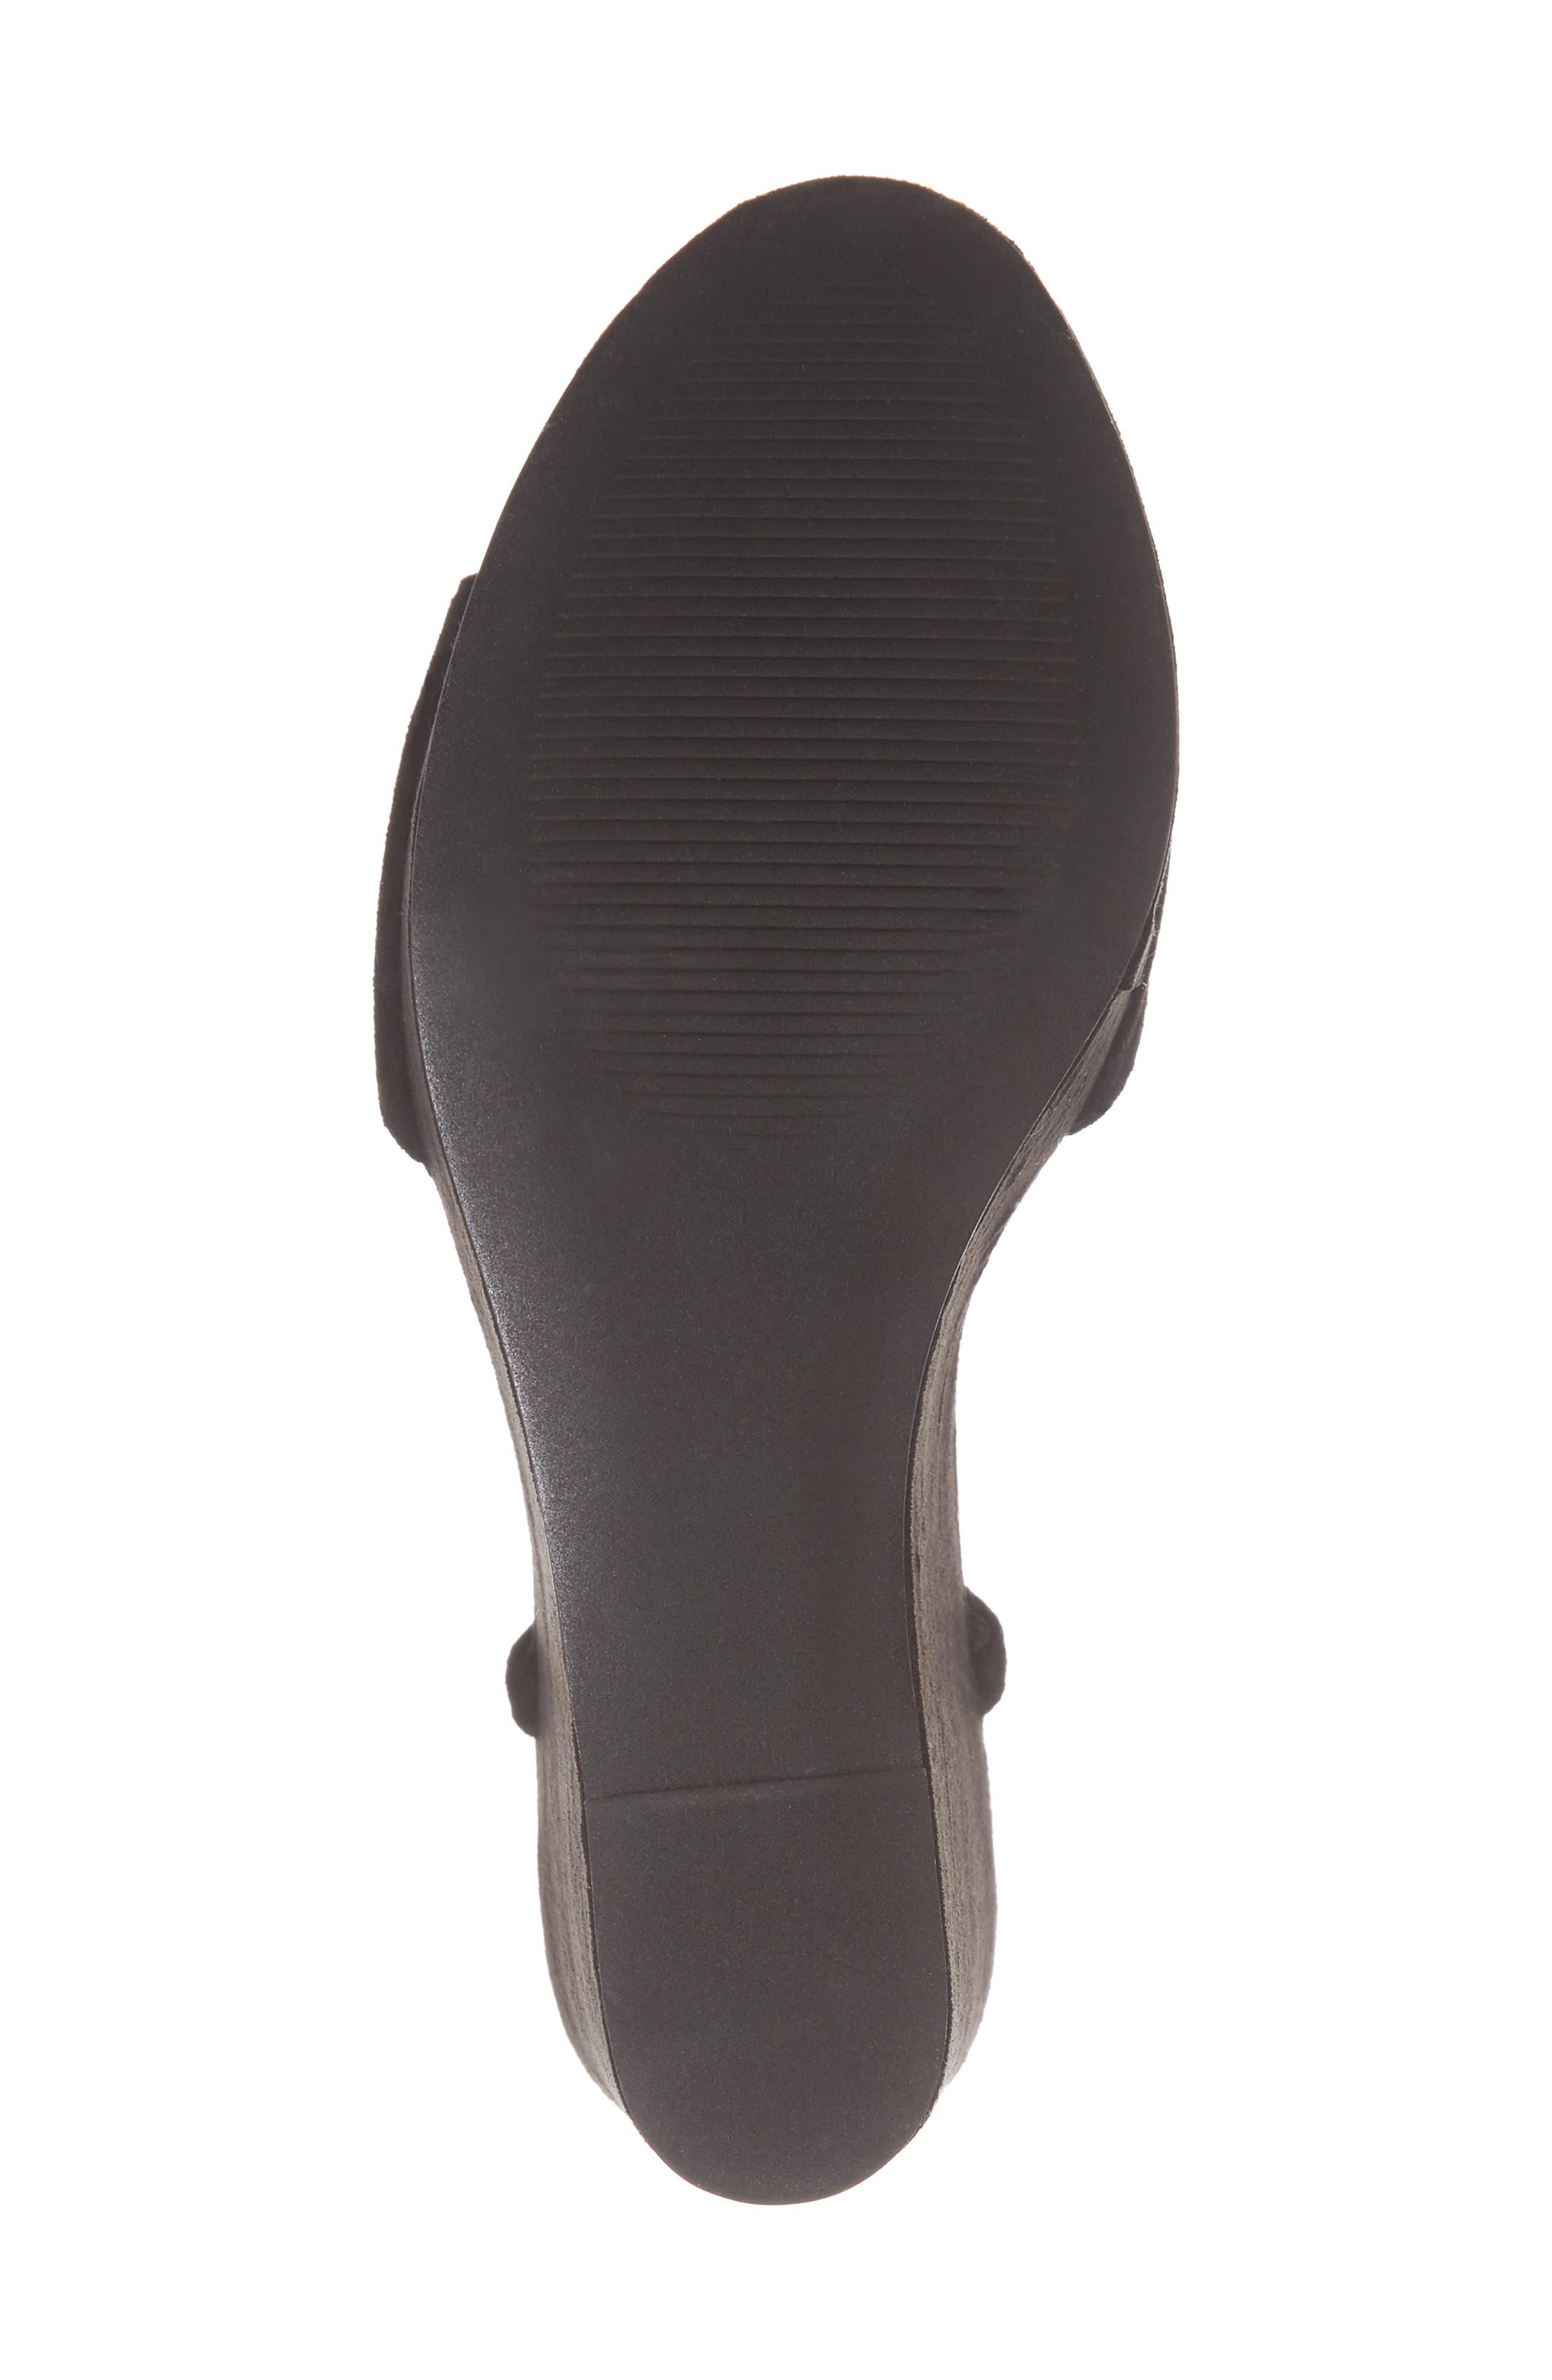 Truce Wedge Sandal,                             Alternate thumbnail 6, color,                             Black Suede